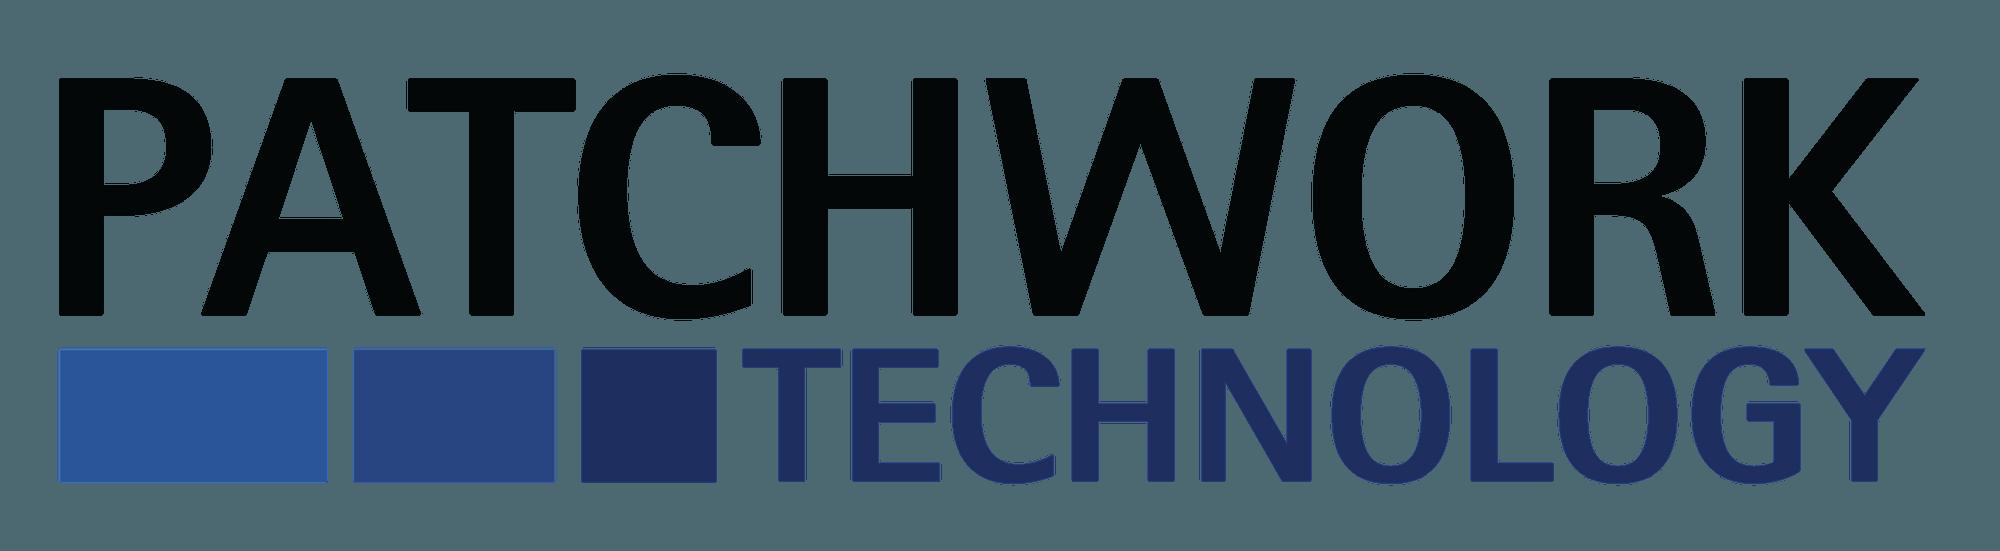 PATCHWORK TECHNOLOGY